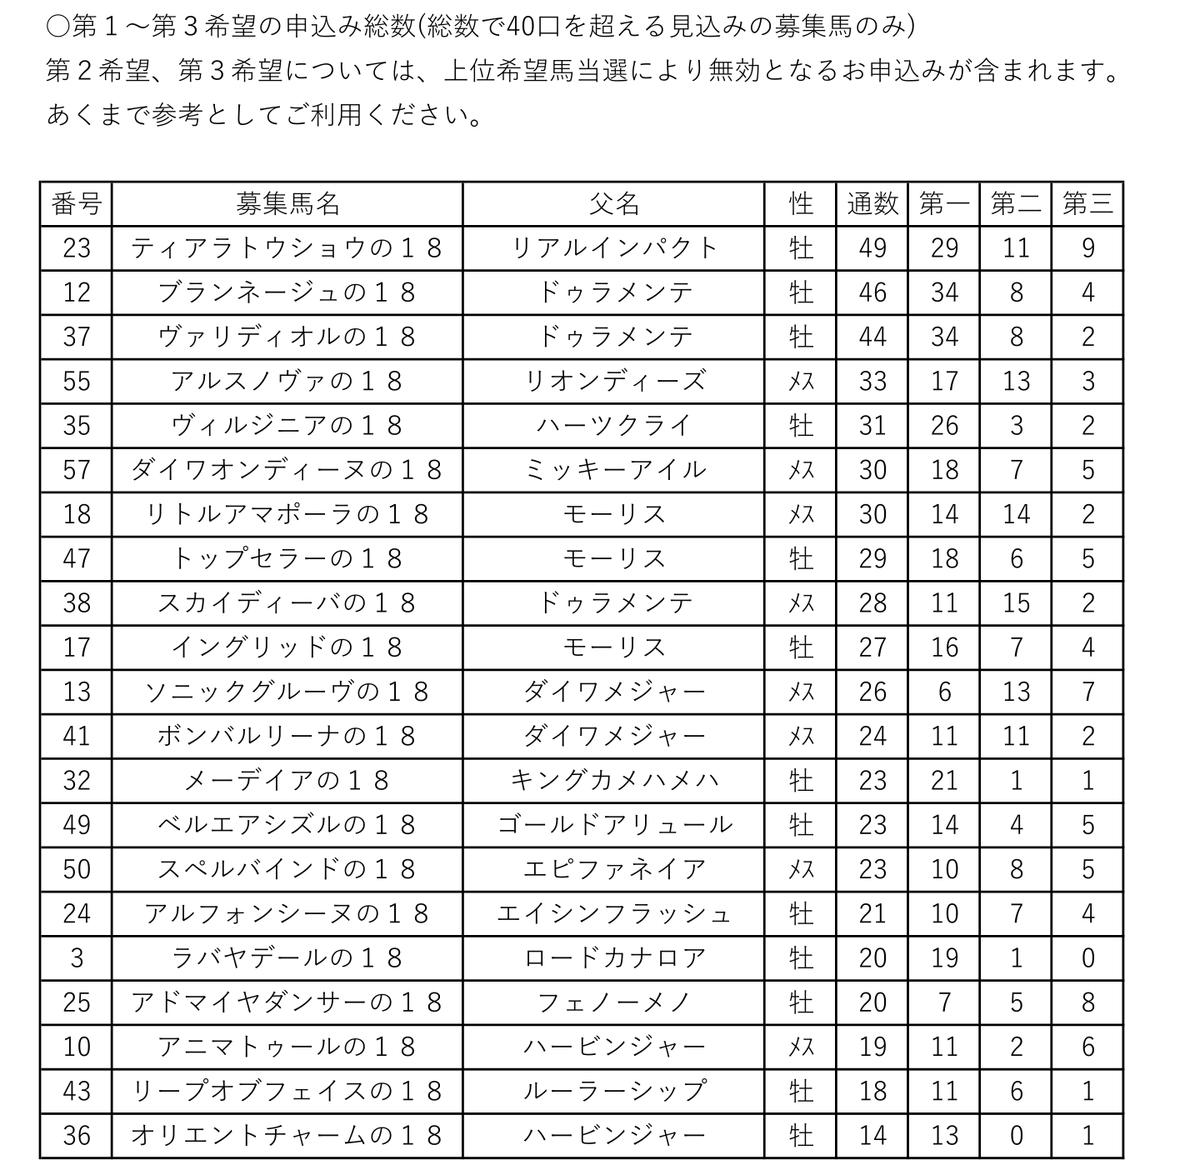 f:id:kurokiri-G1:20190617235859p:plain